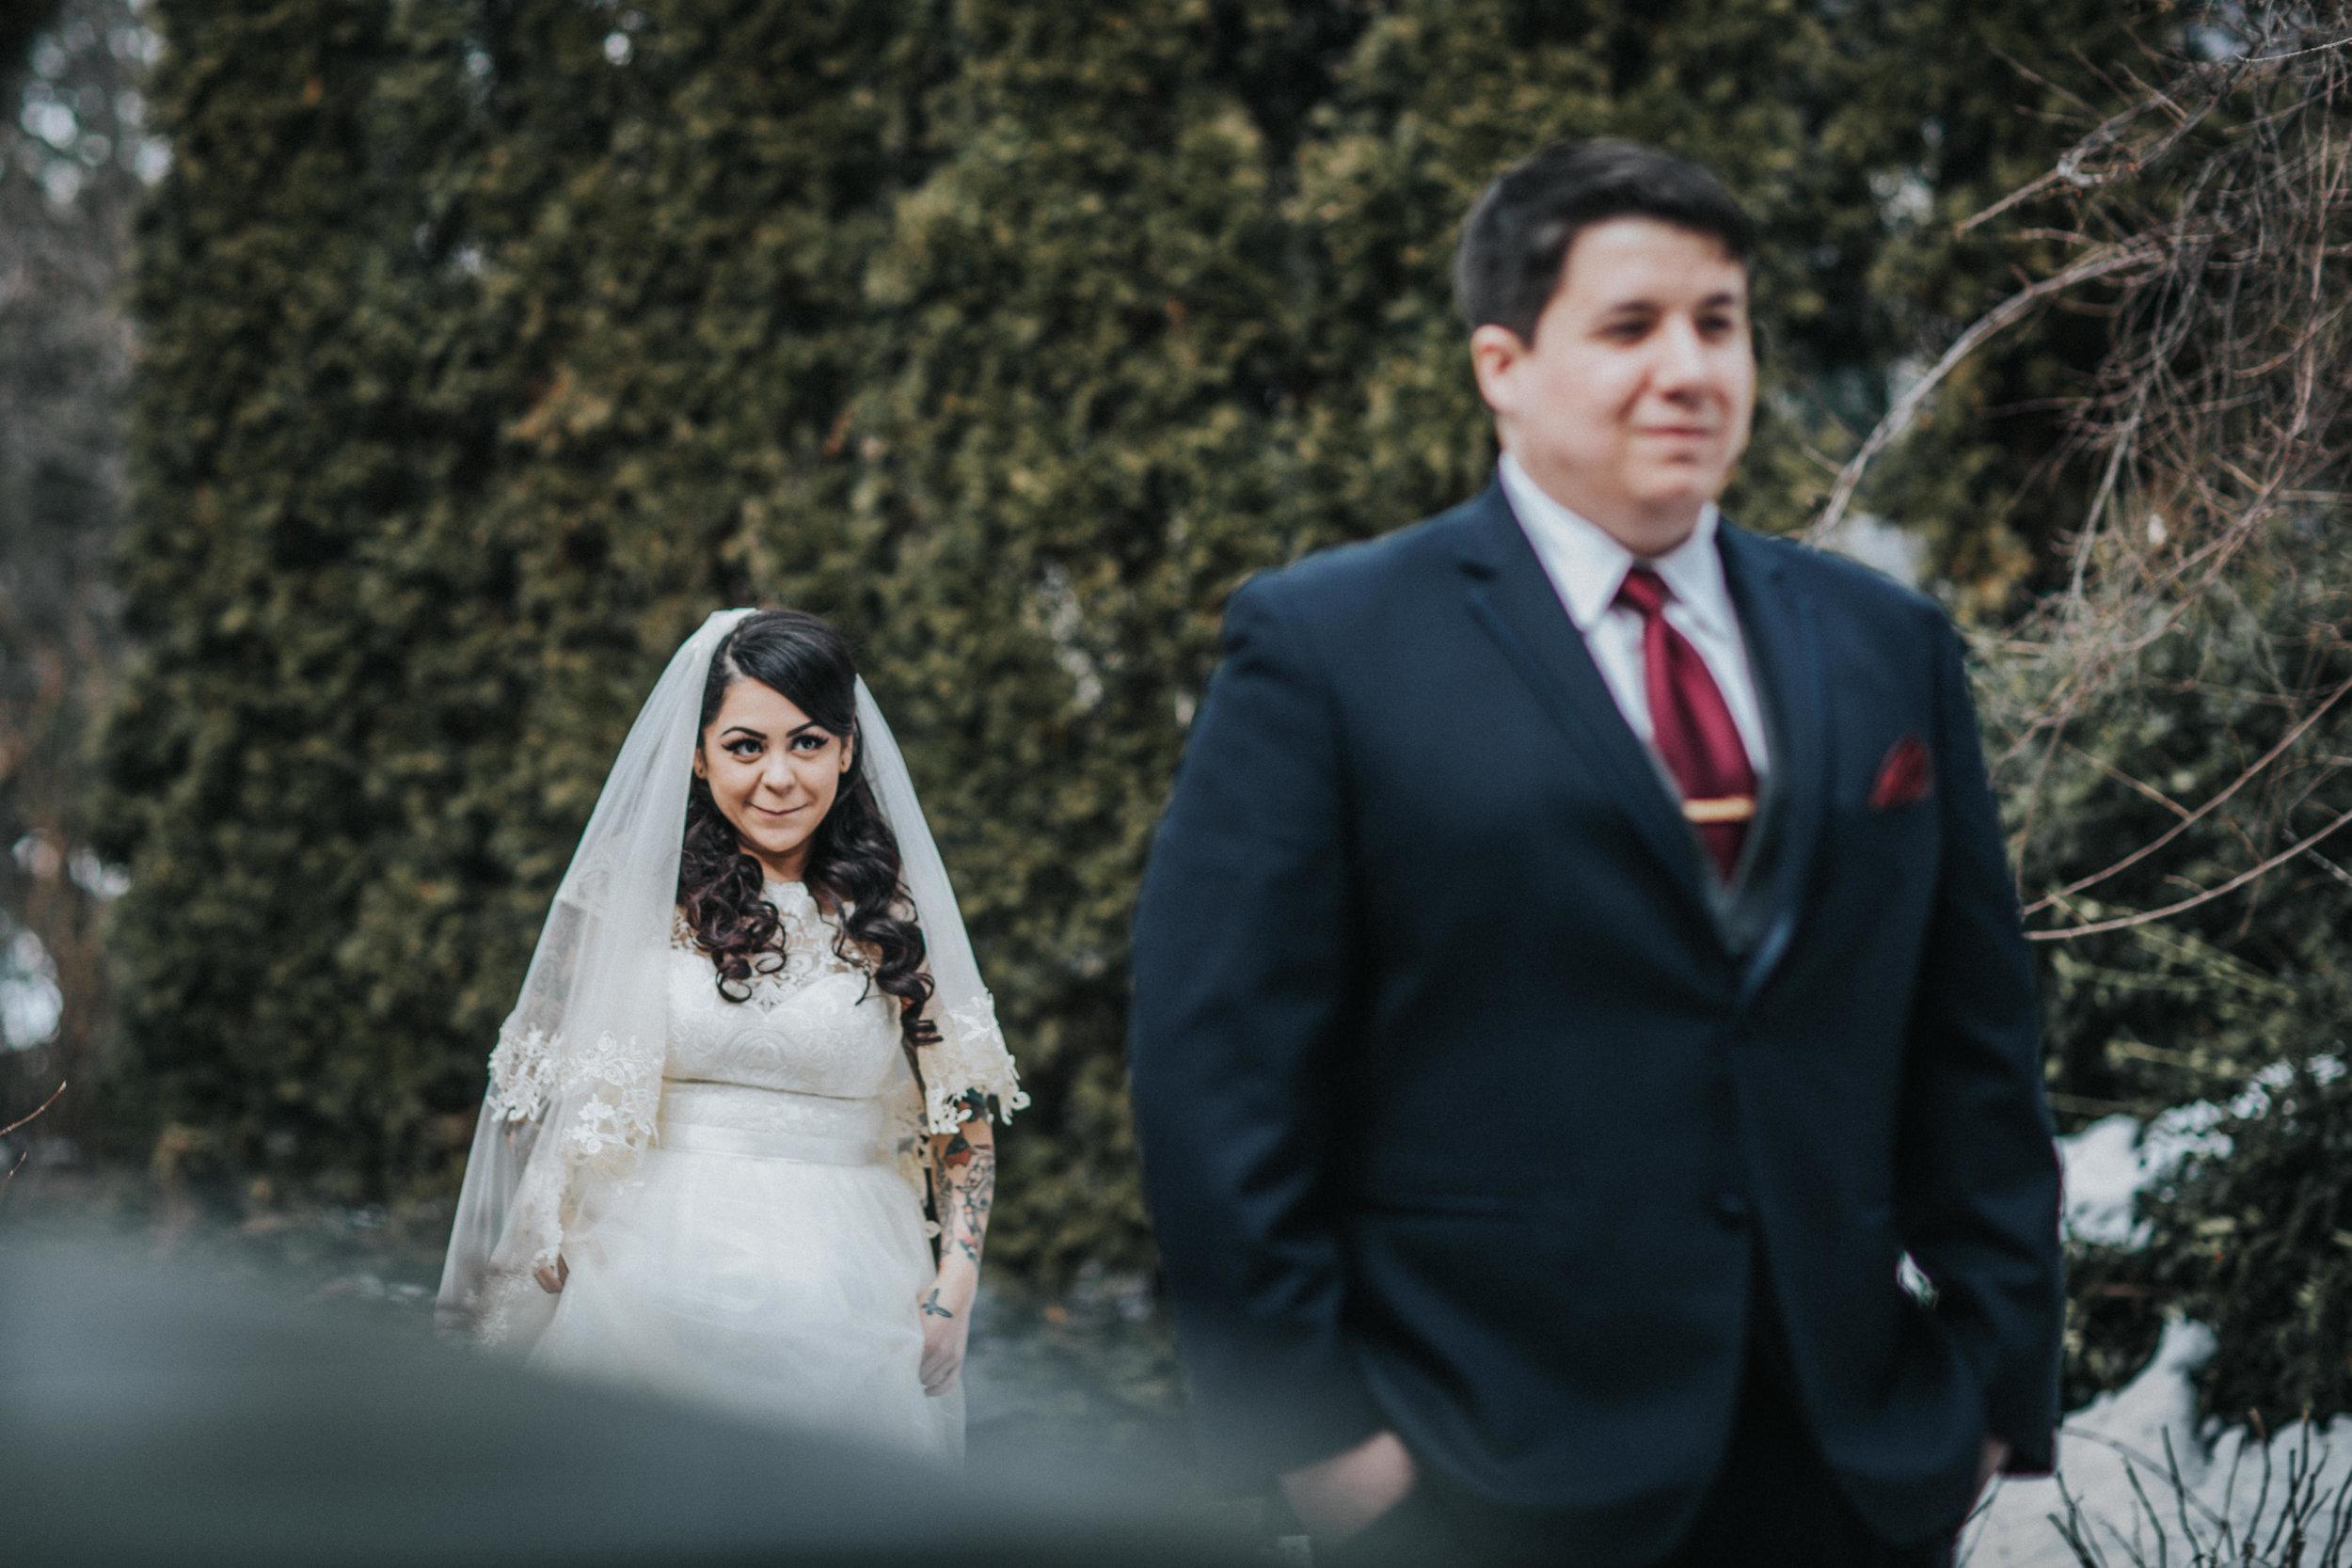 New-Jersey-Wedding-Photographer-ReceptionCenter-Valeria&Mike-First-Look-Bride&Groom (51 of 69).jpg